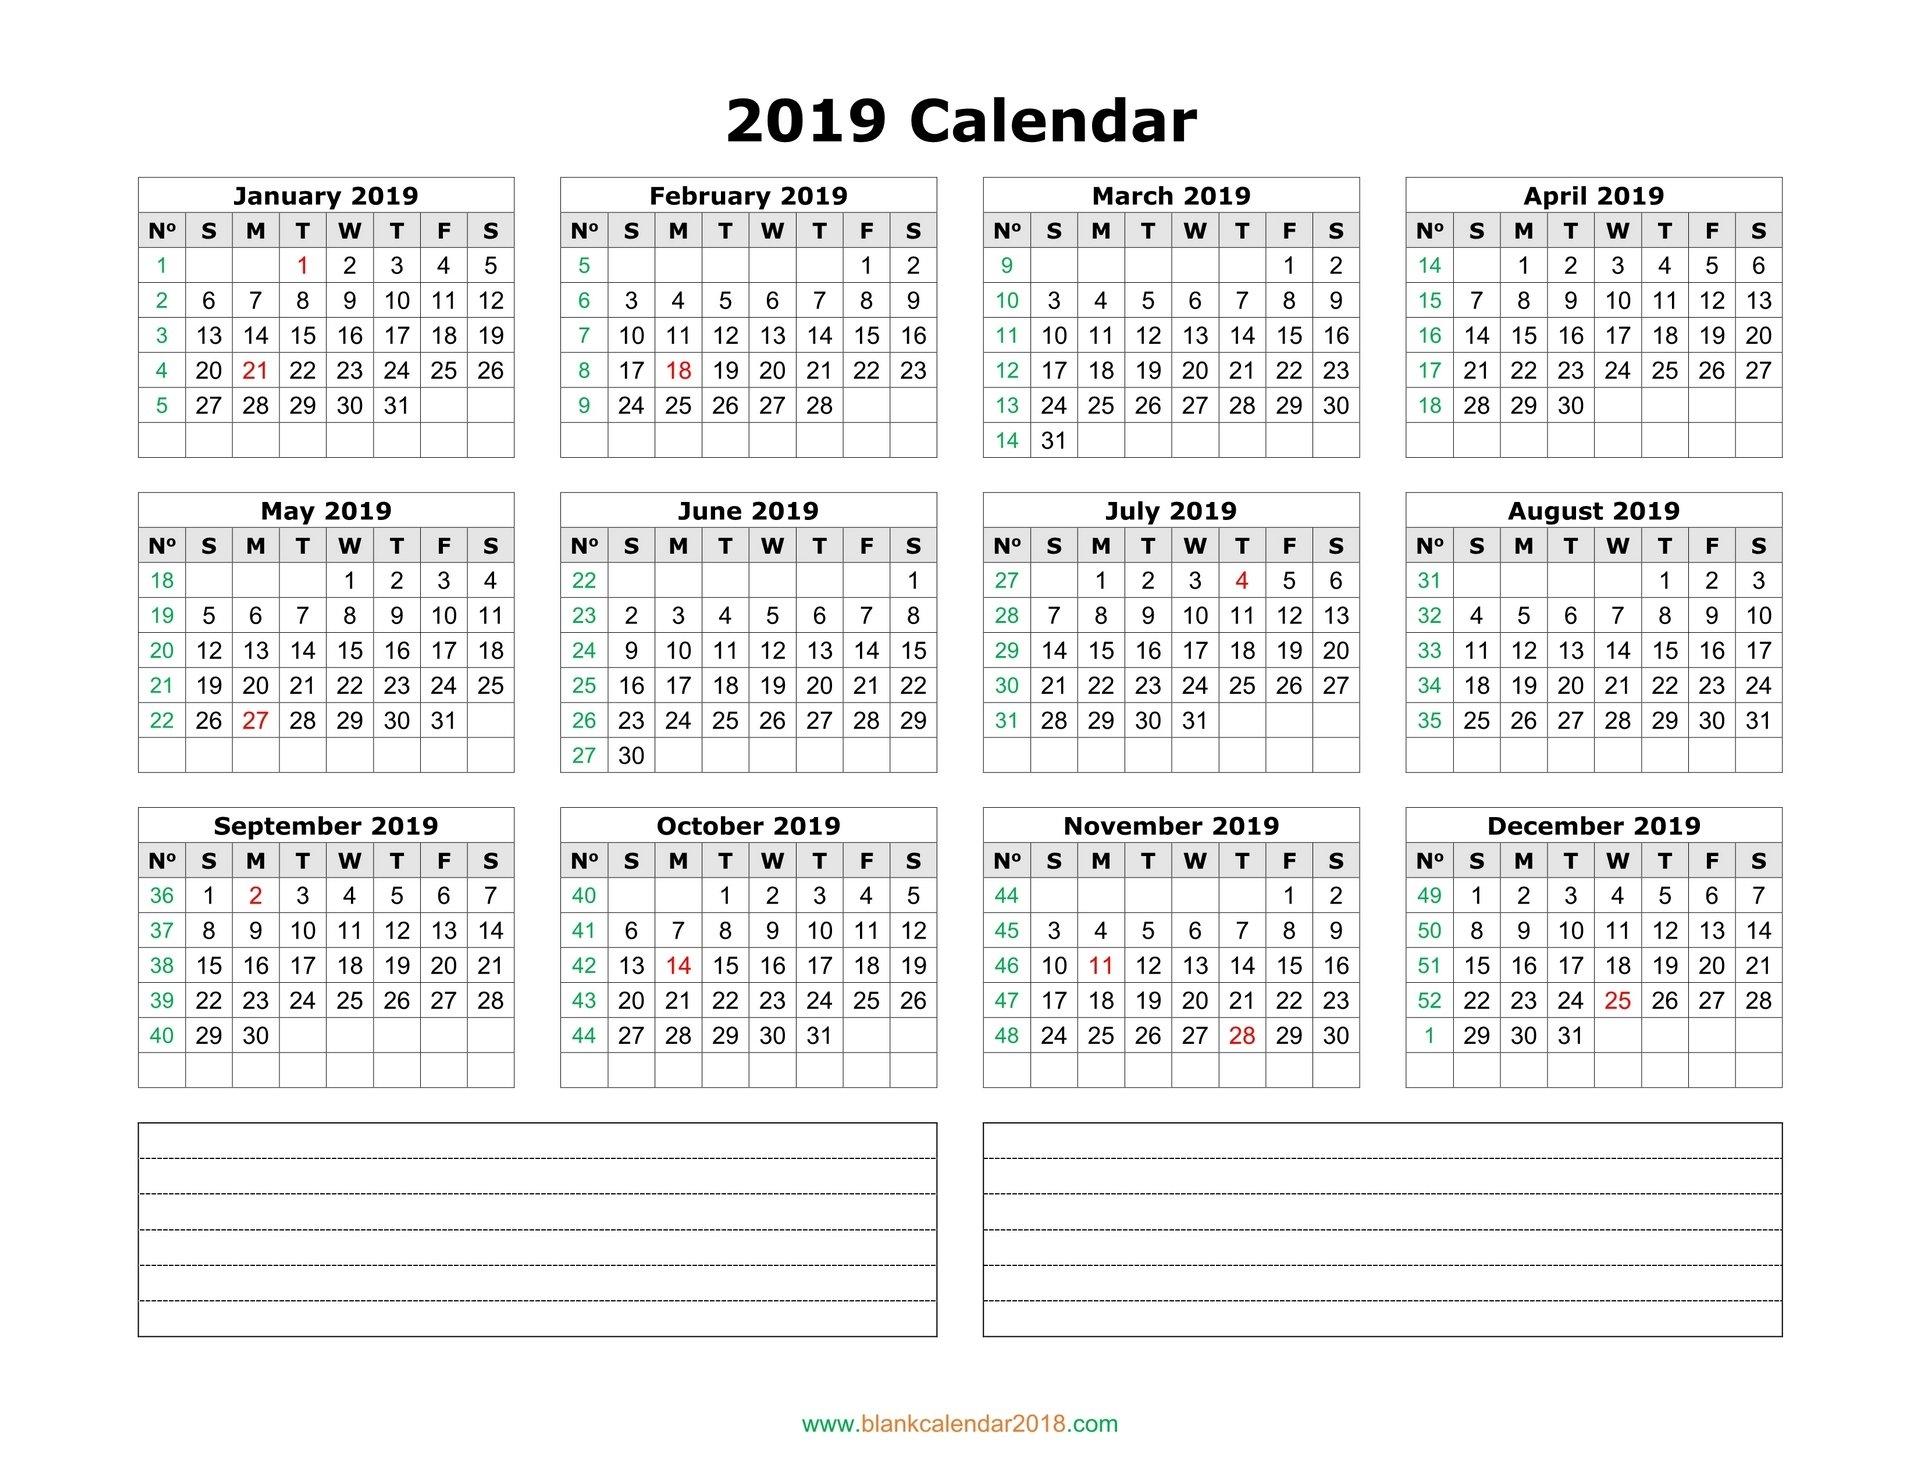 Blank Calendar 2019 Calendar 2019 Pdf